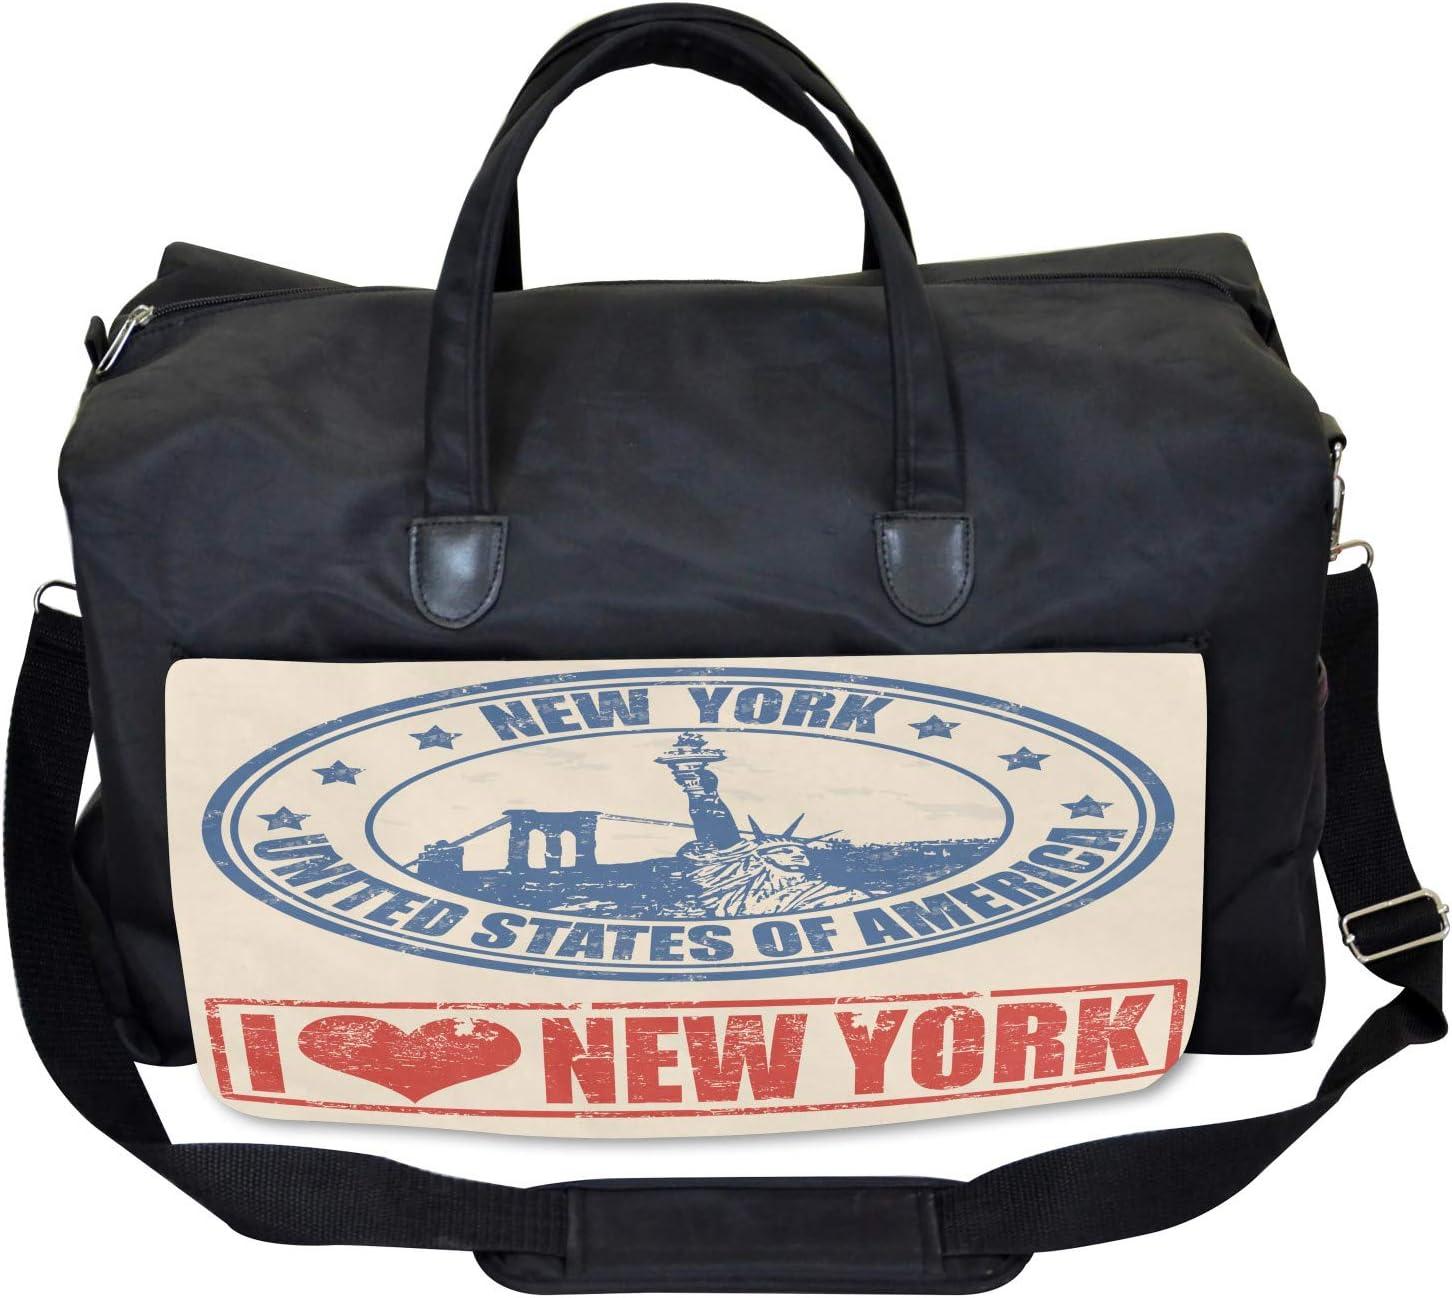 Love NYC in Red Blue Large Weekender Carry-on Ambesonne Vintage Gym Bag